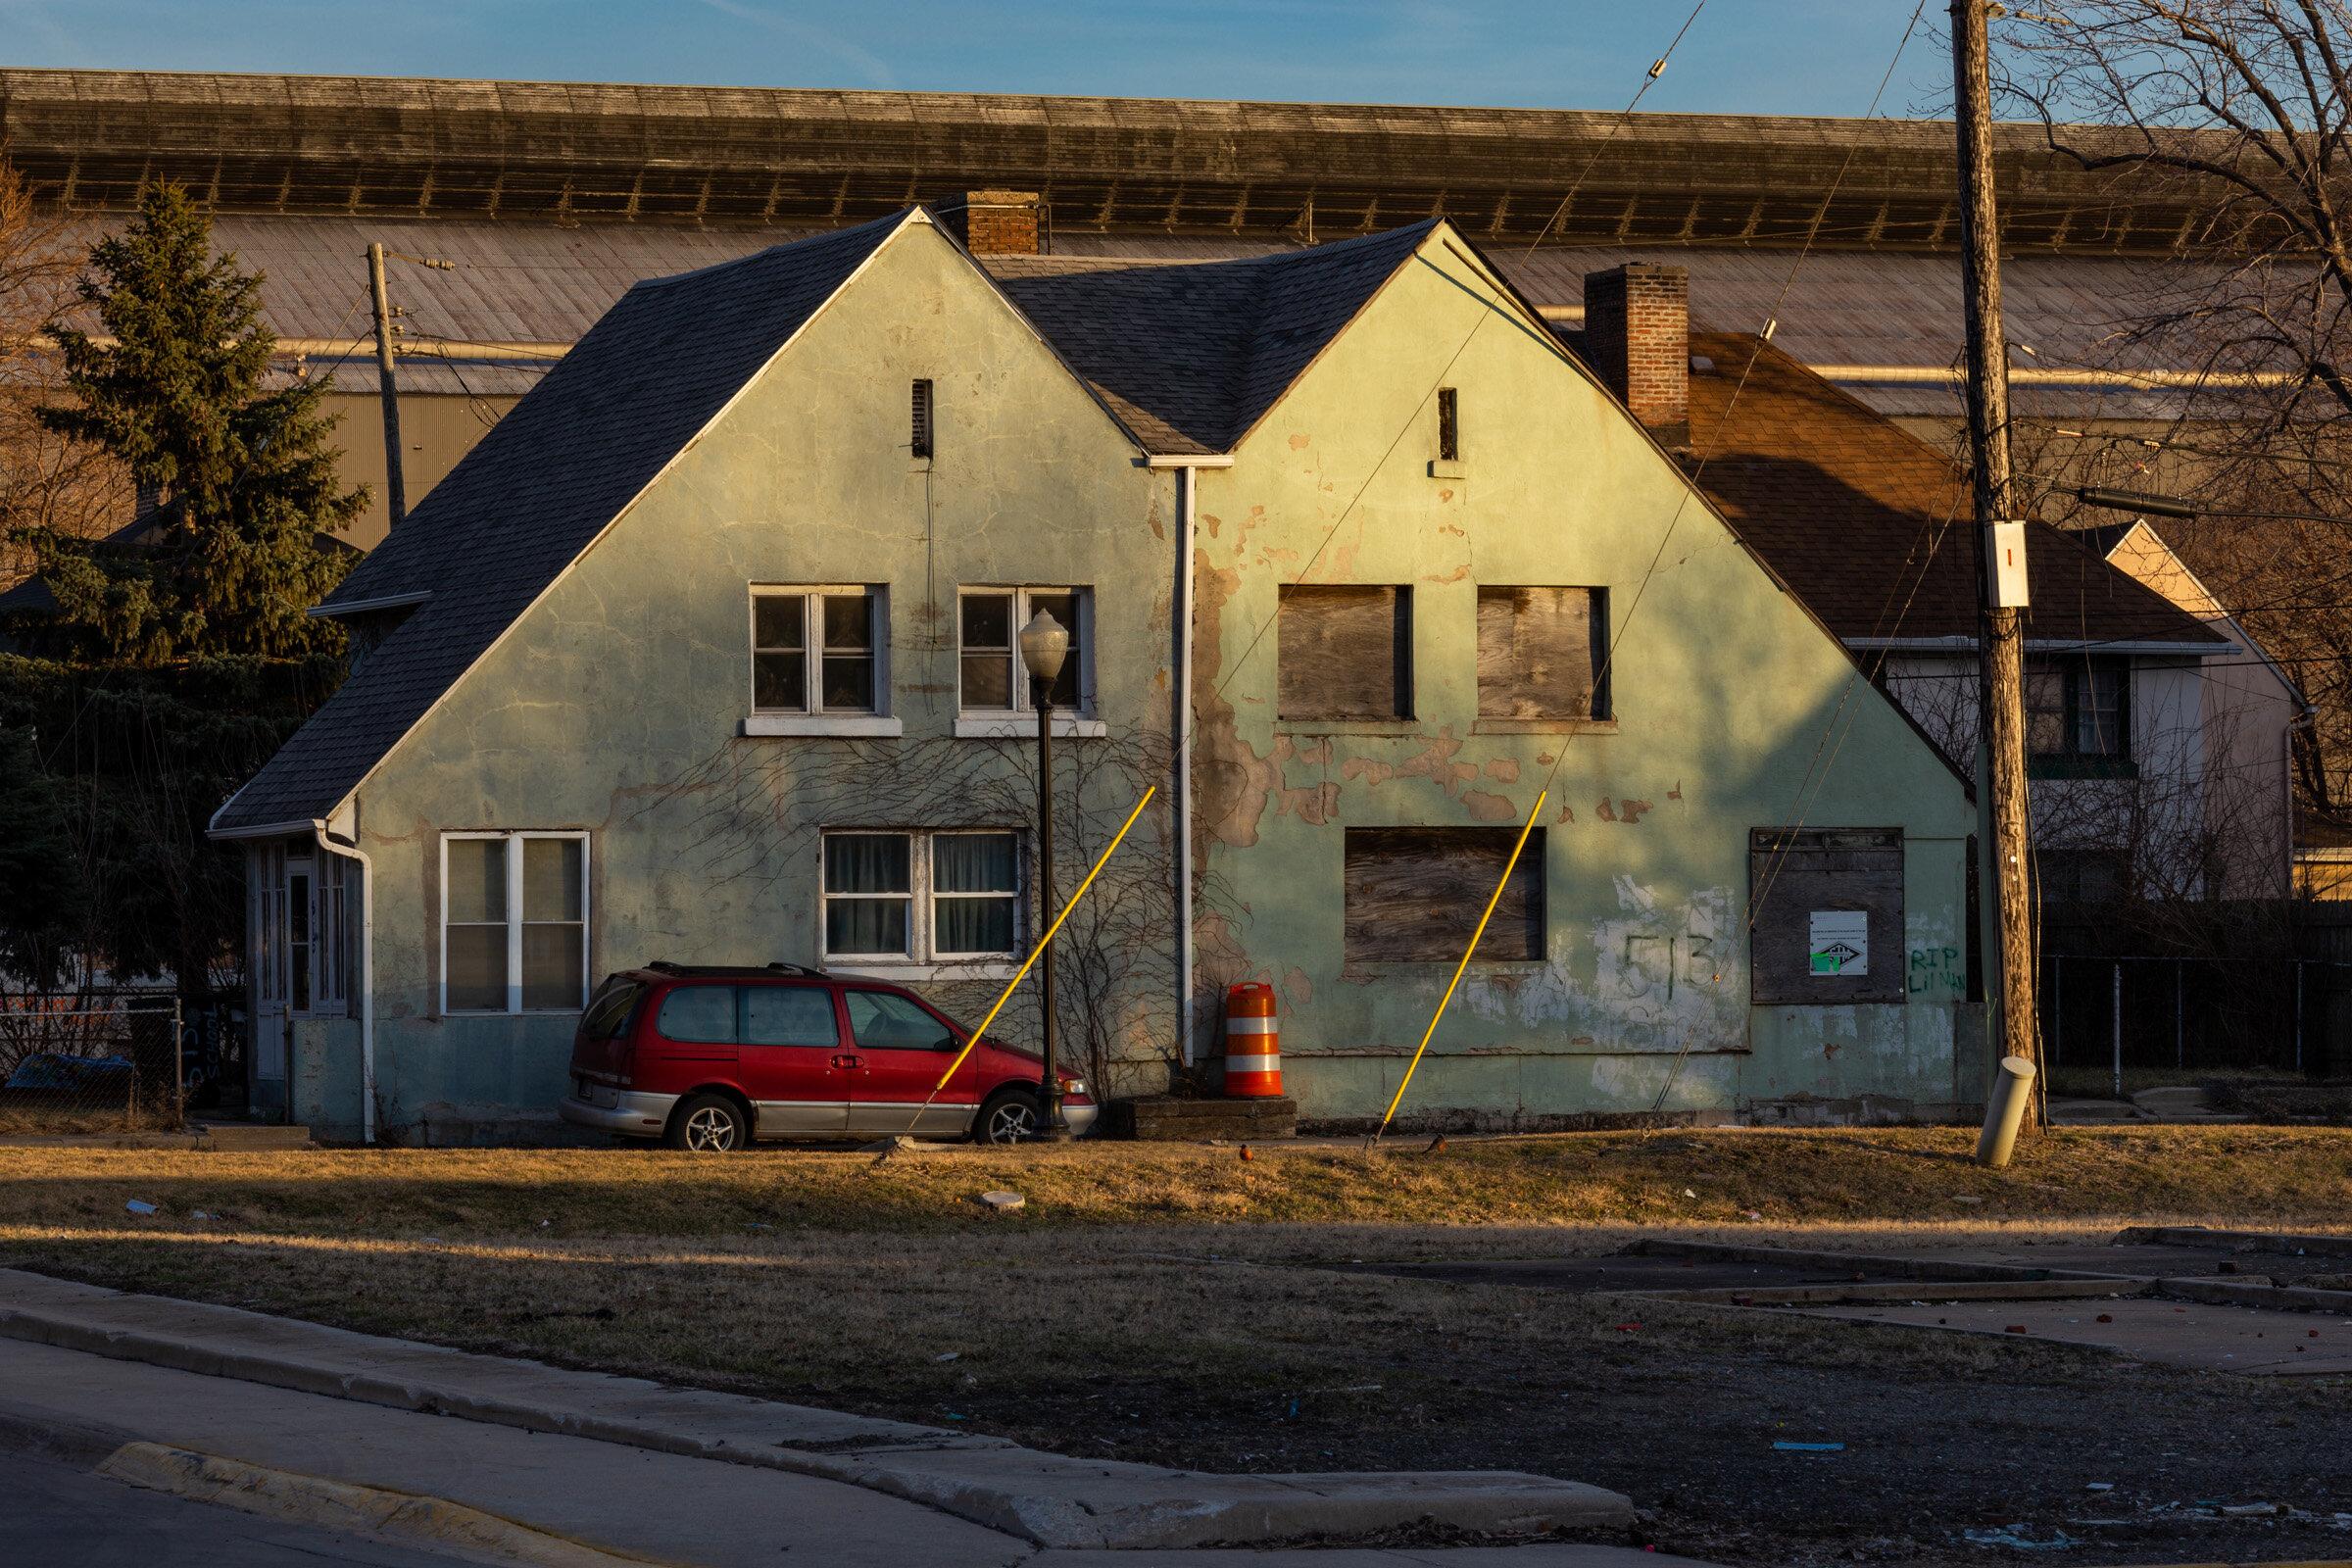 Figure 5. Marktown Duplex with ArcelorMittal Steel Mill Building, March 2019. Photograph by Matthew Kaplan.